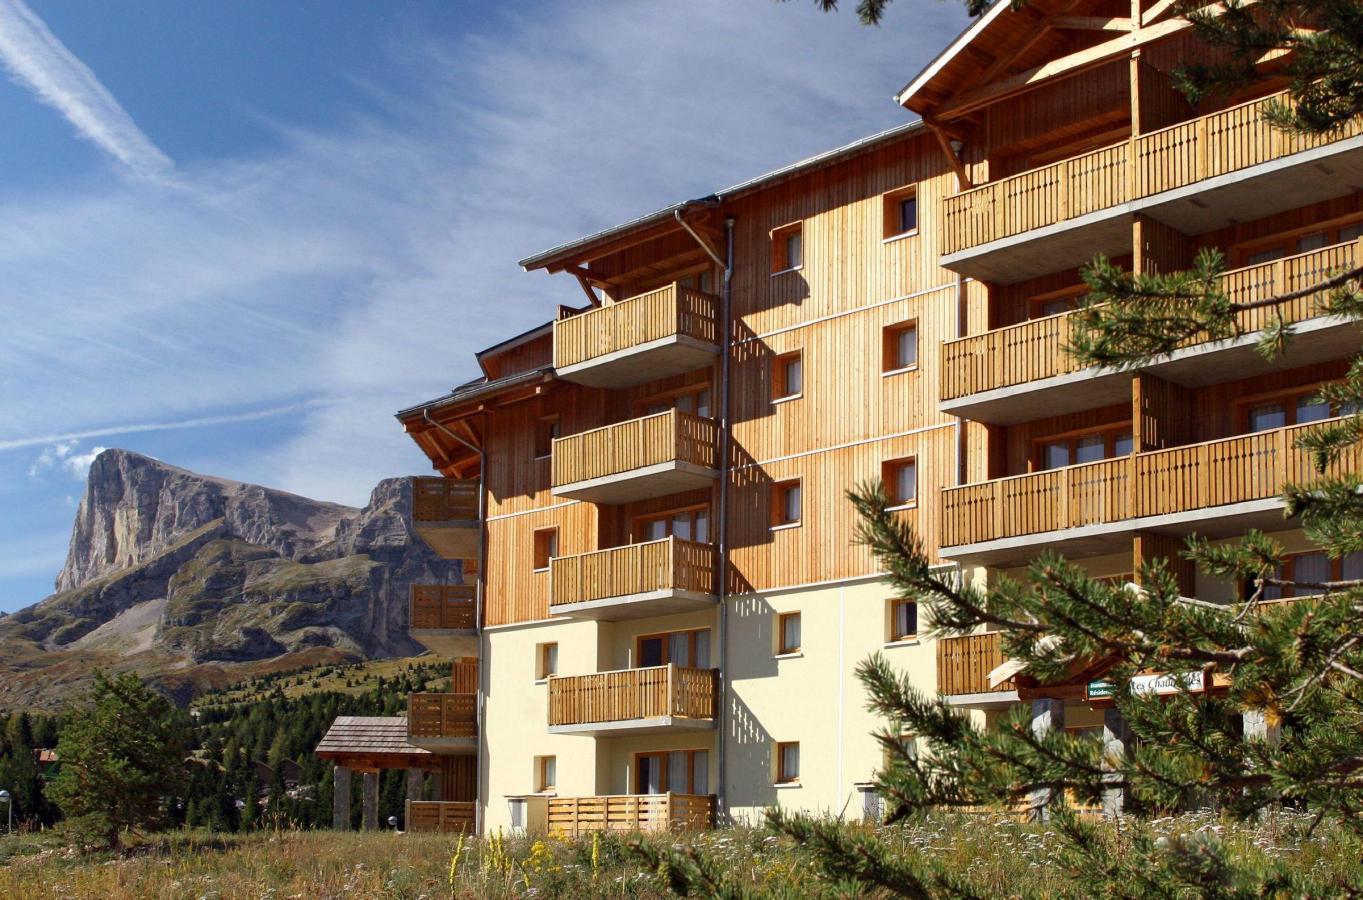 Locazione Les Chalets Superd estate